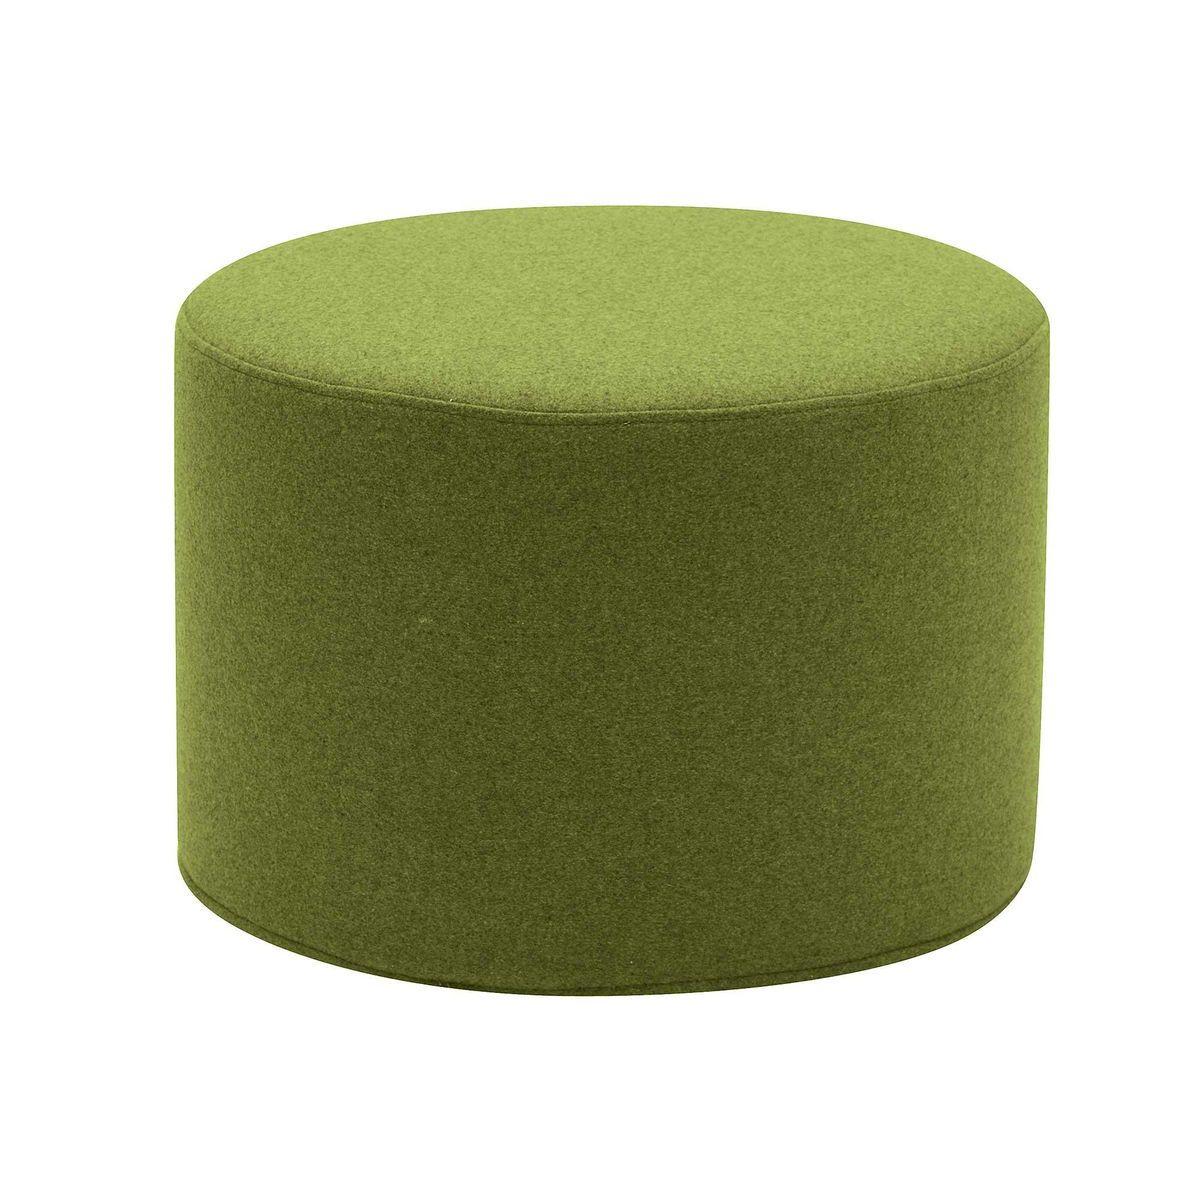 Softline - Drum Stool / Side Table S - light green/Felt fabric 855/  sc 1 st  AmbienteDirect & Drum Stool / Side Table S | Softline | AmbienteDirect.com islam-shia.org